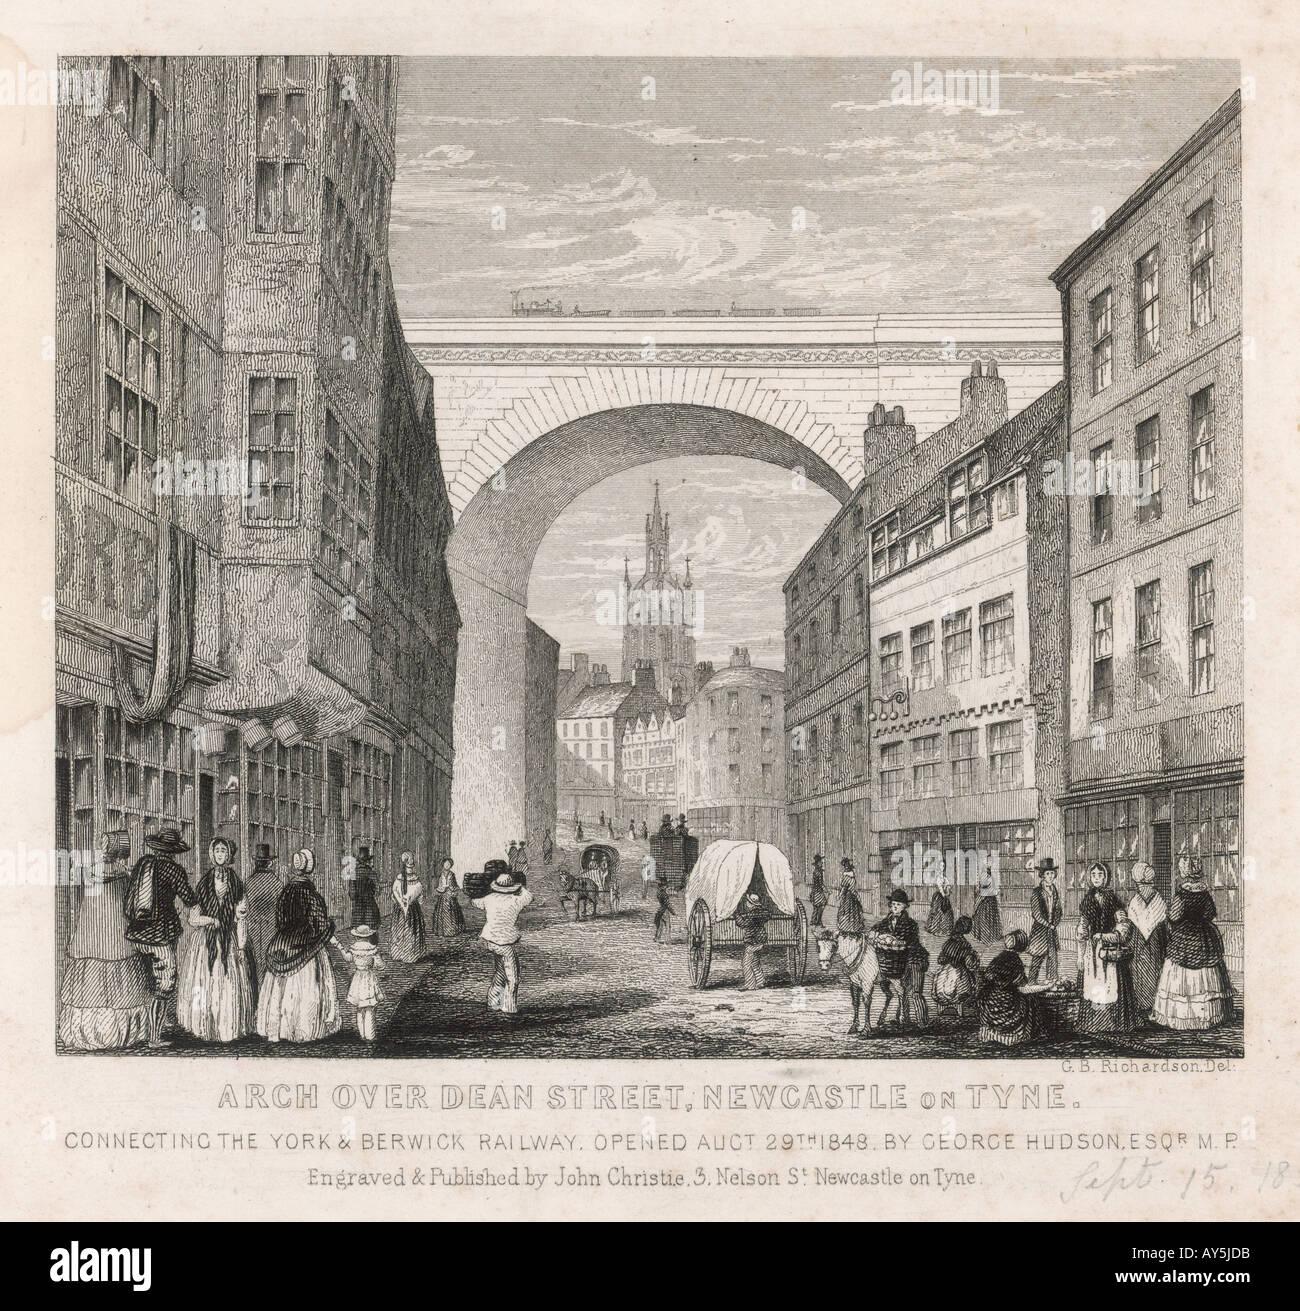 England Newcastle 1848 - Stock Image